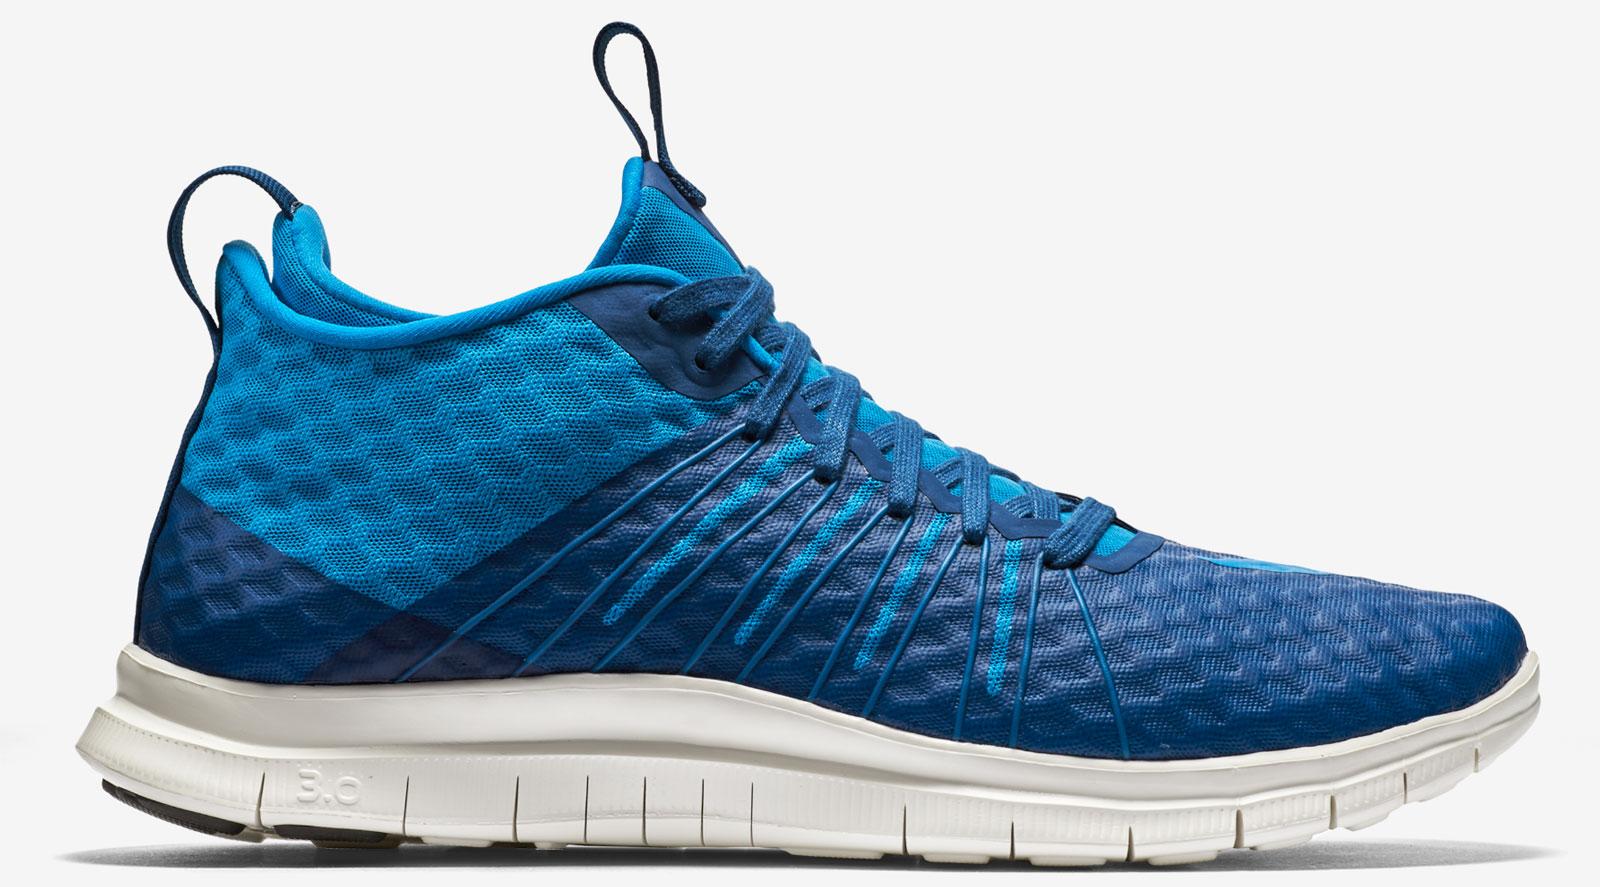 Blaue Nike Free Hypervenom 2 FS Sneaker enthüllt - Nur ...